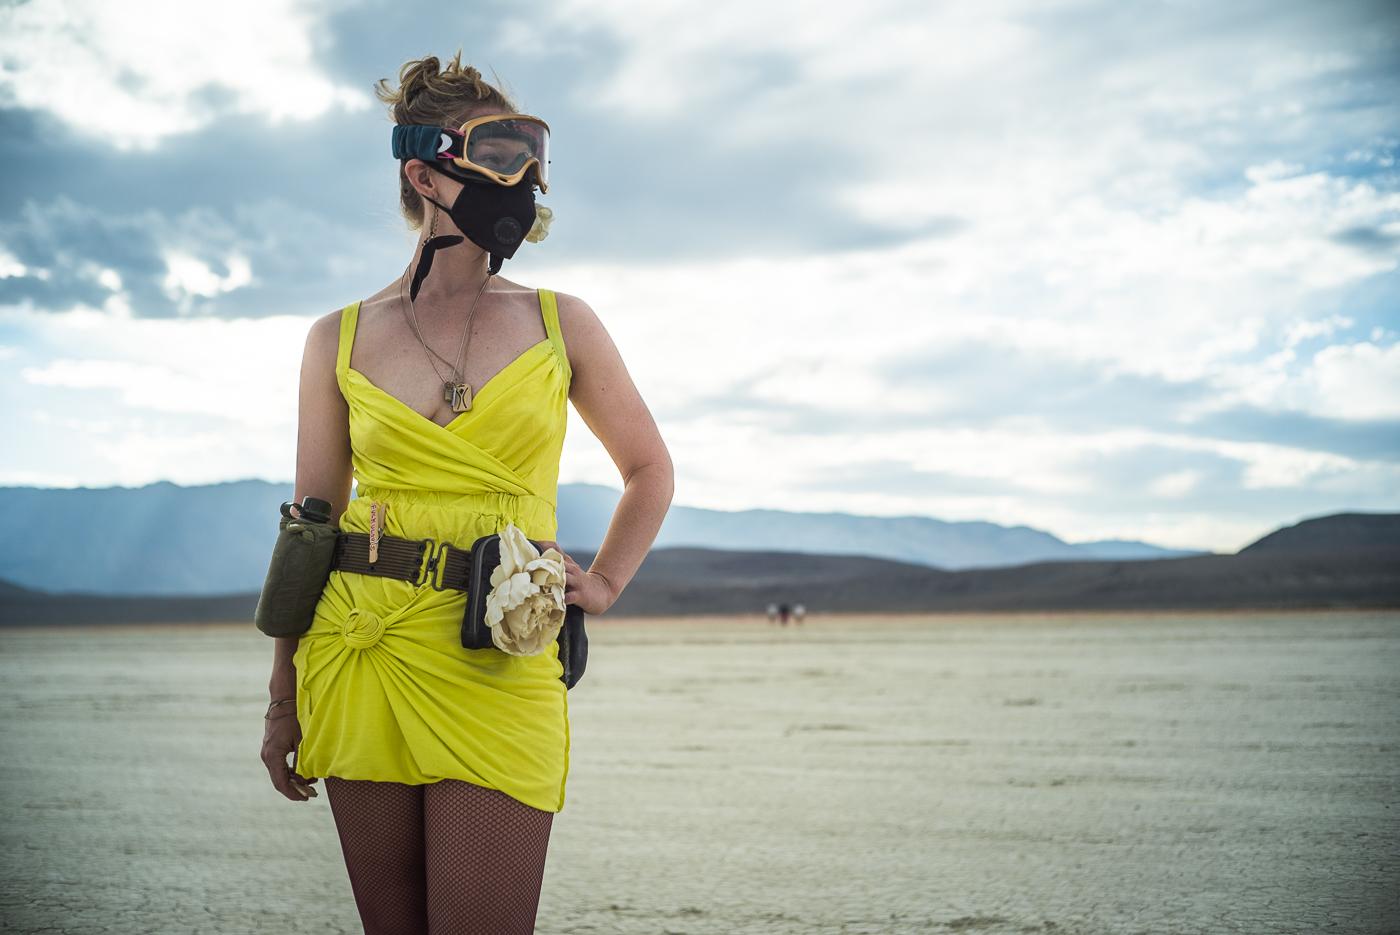 Burning Man 2014 women's costume sunset playa portrait